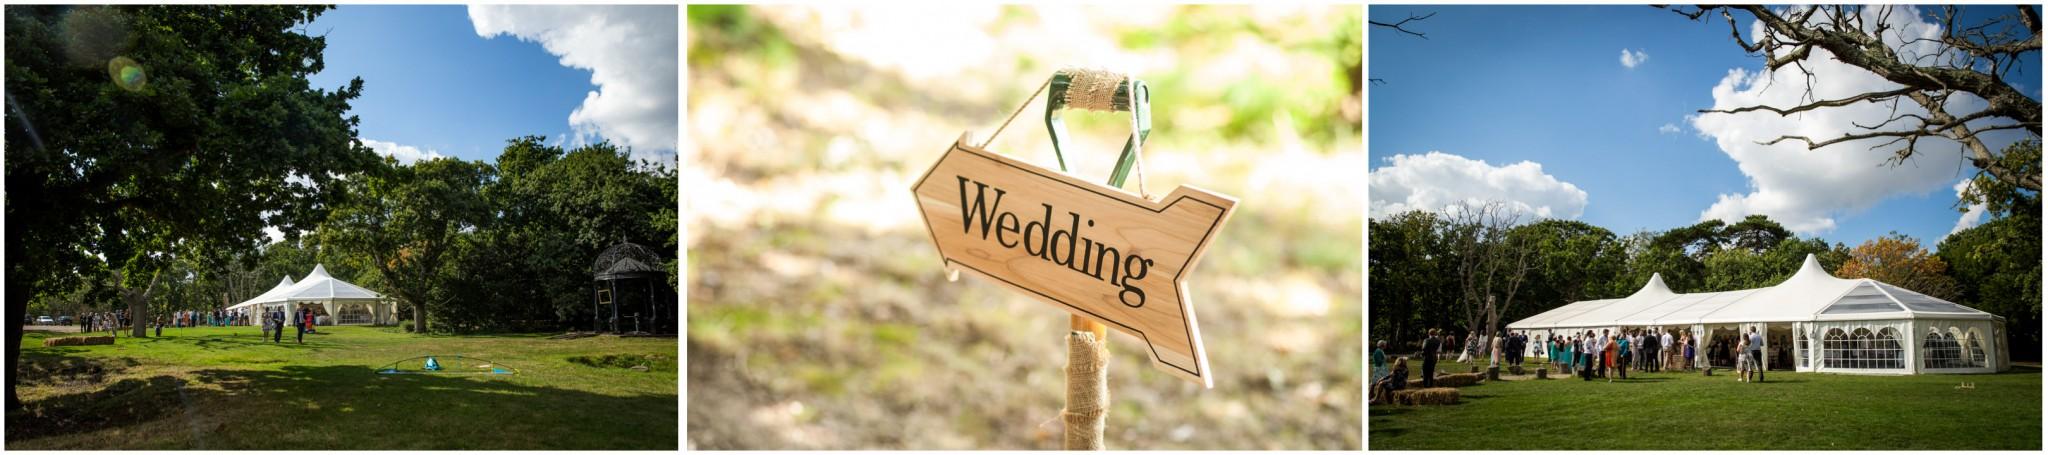 Tournerbury Woods Estate Wedding Marquee Exterior